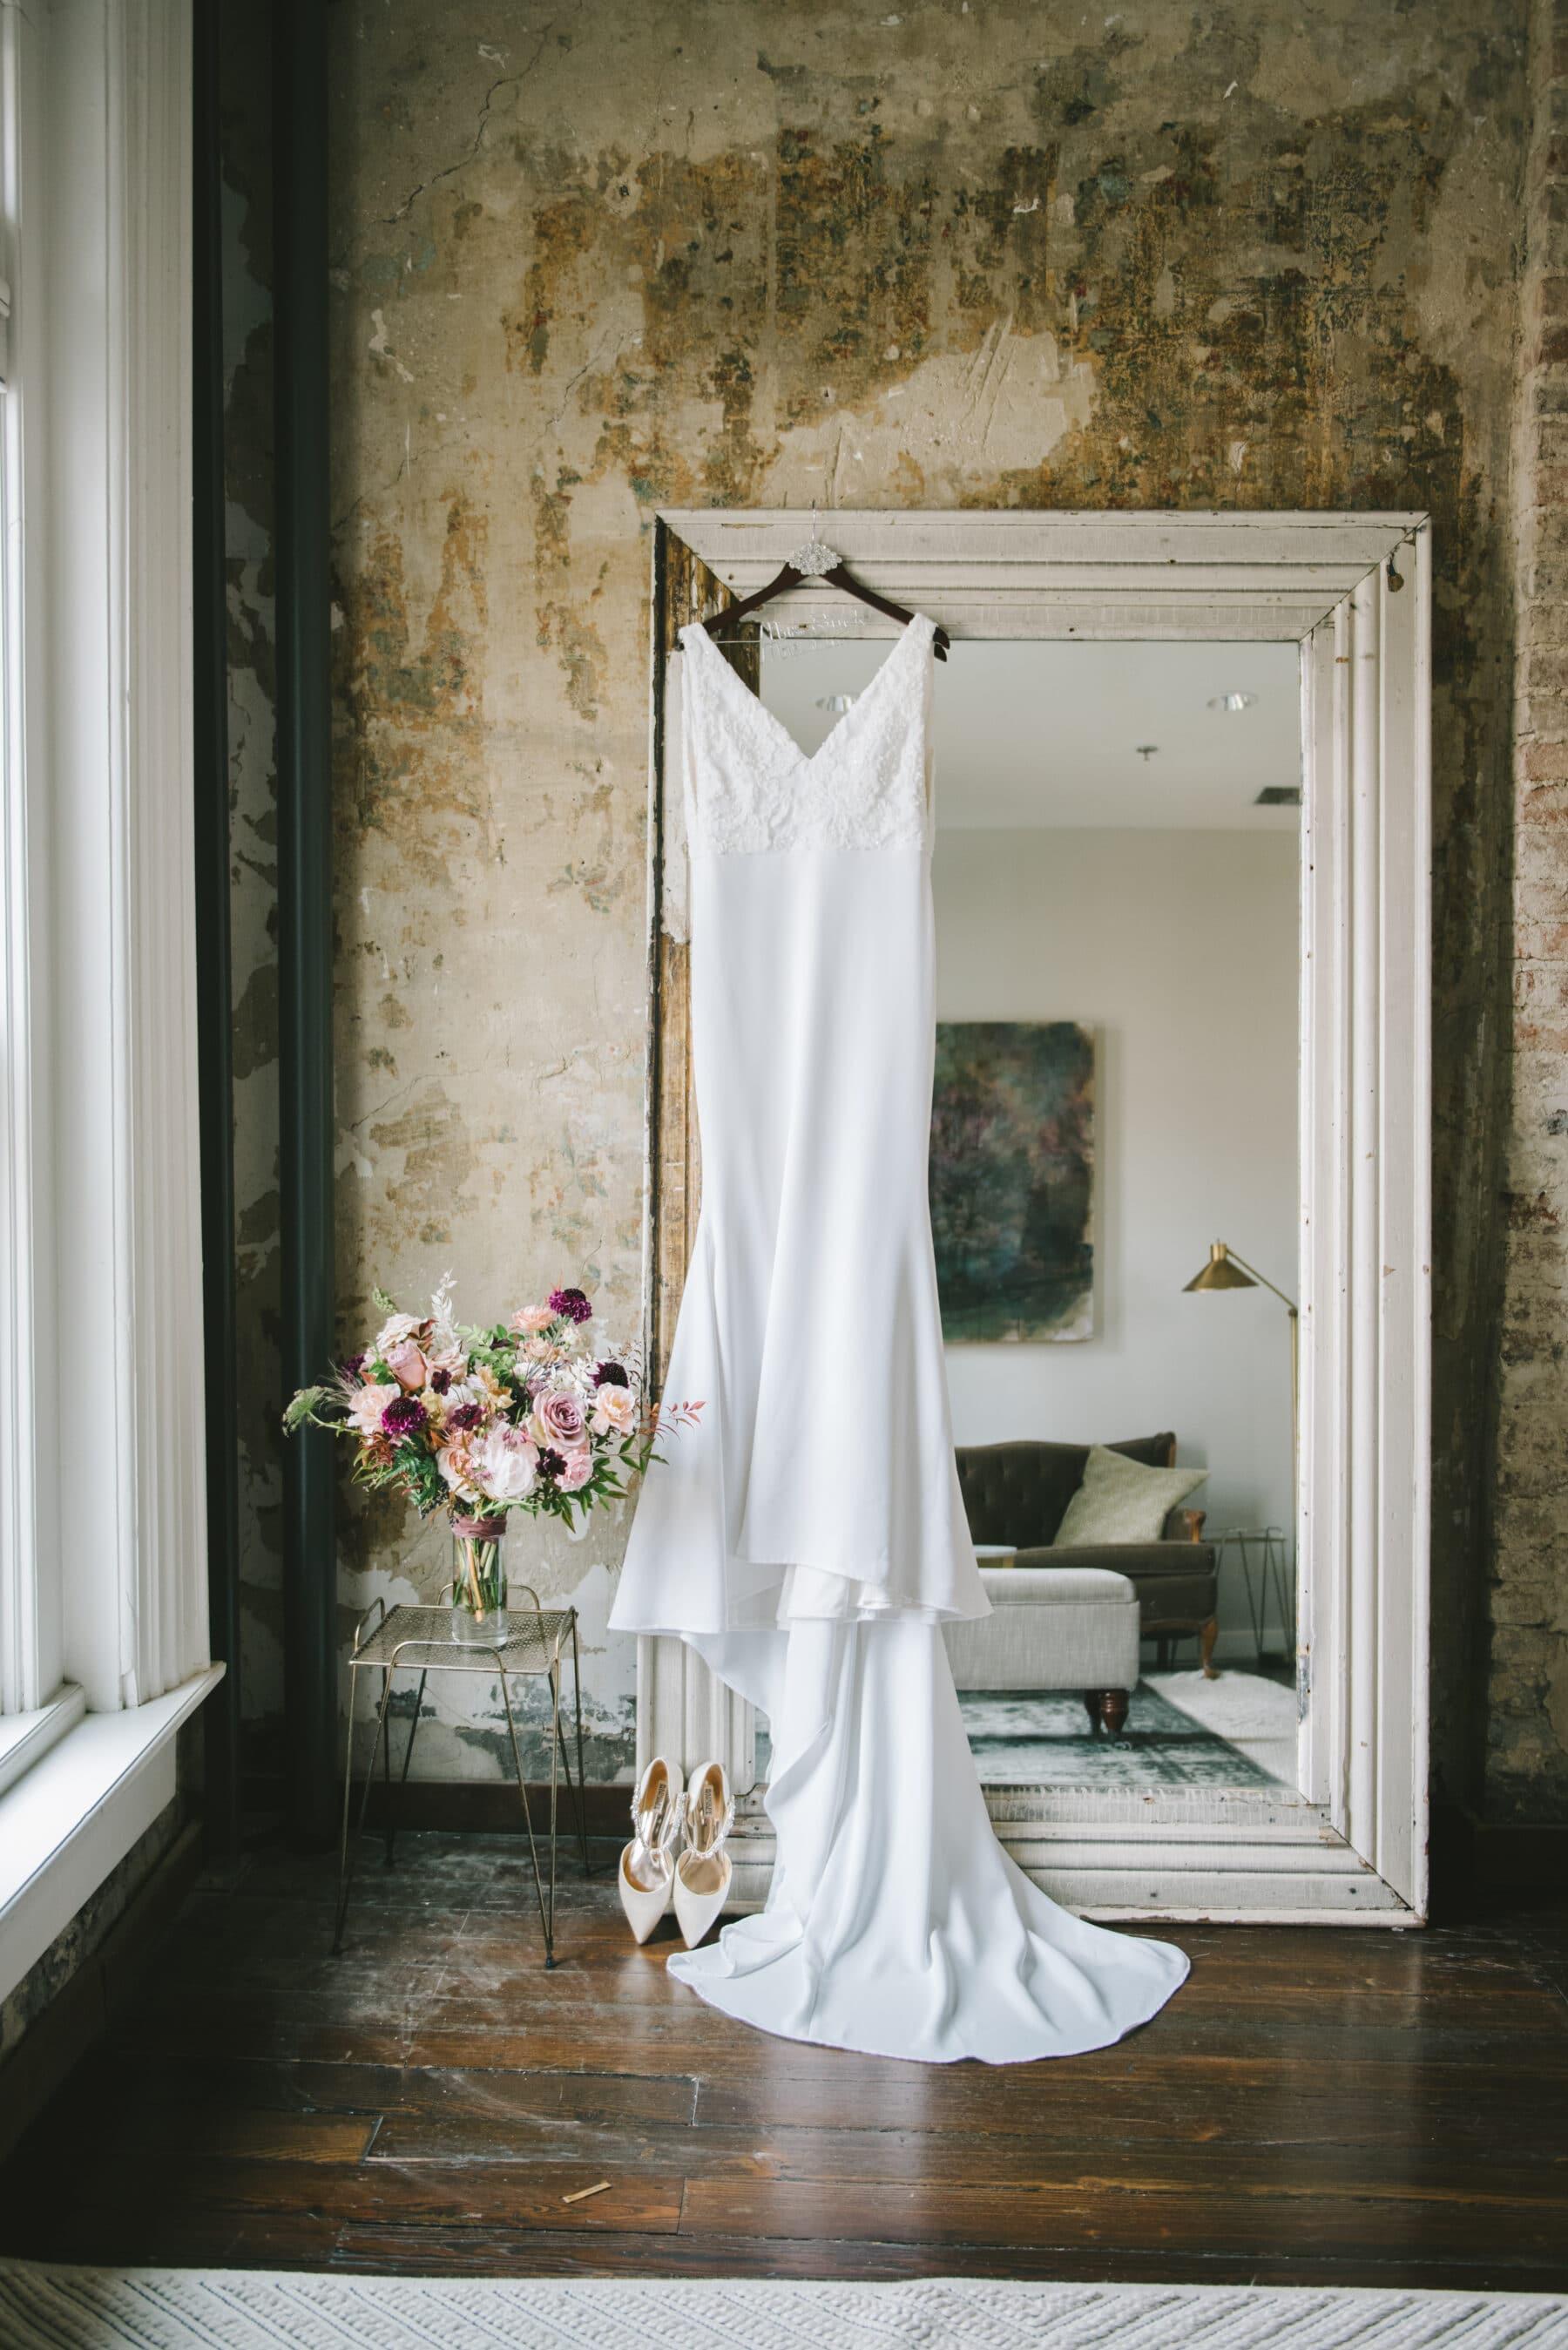 Alyssa Kristin Wedding Dress from The Loveliest Bridal Boutique   Nashville Bride Guide